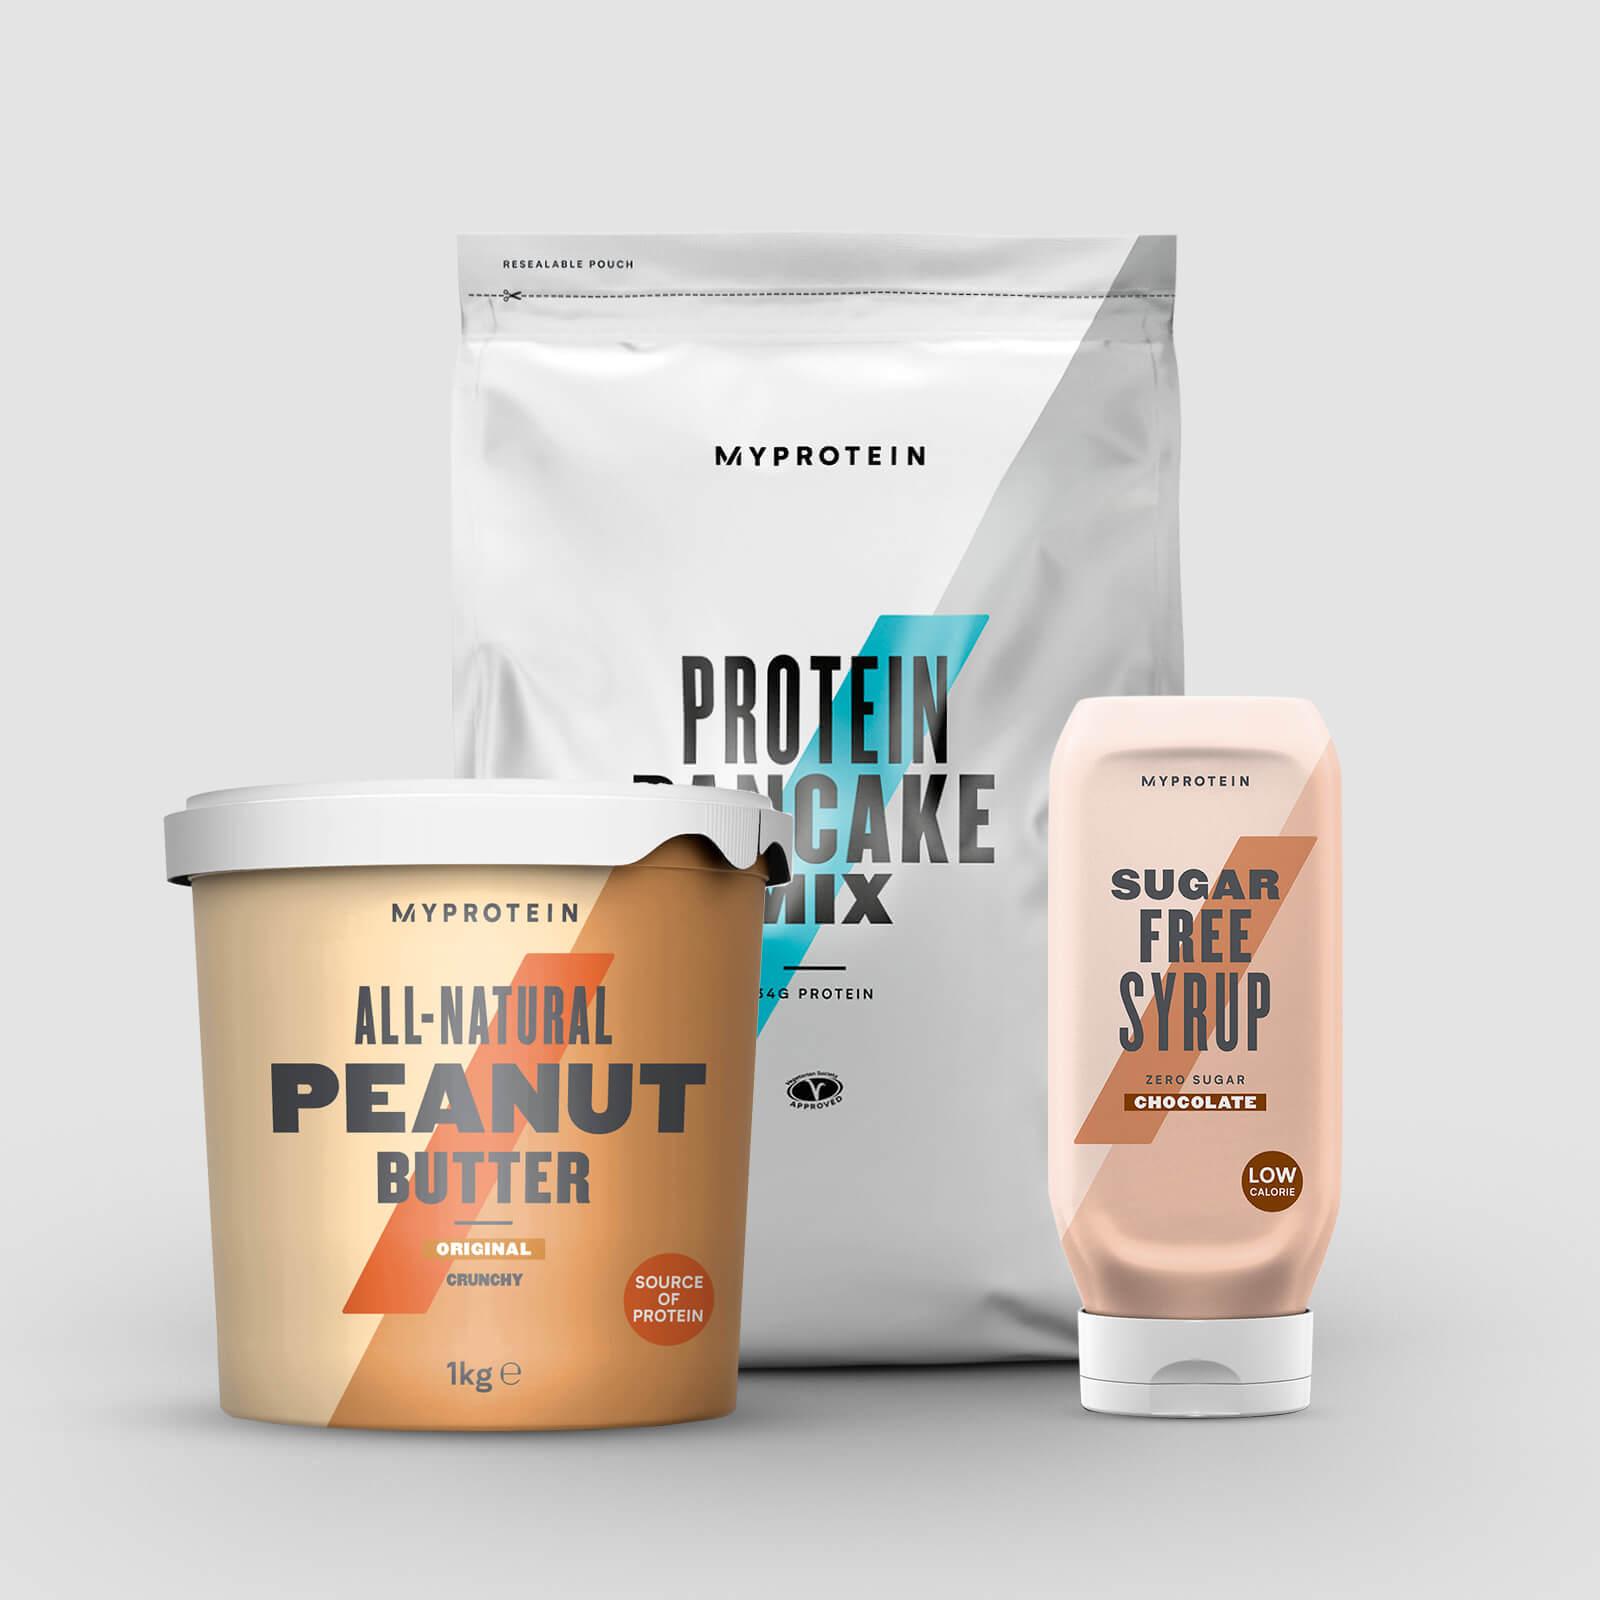 Pack pour Pancake Protéiné - Pancake Mix - Maple Syrup - Syrup - Maple